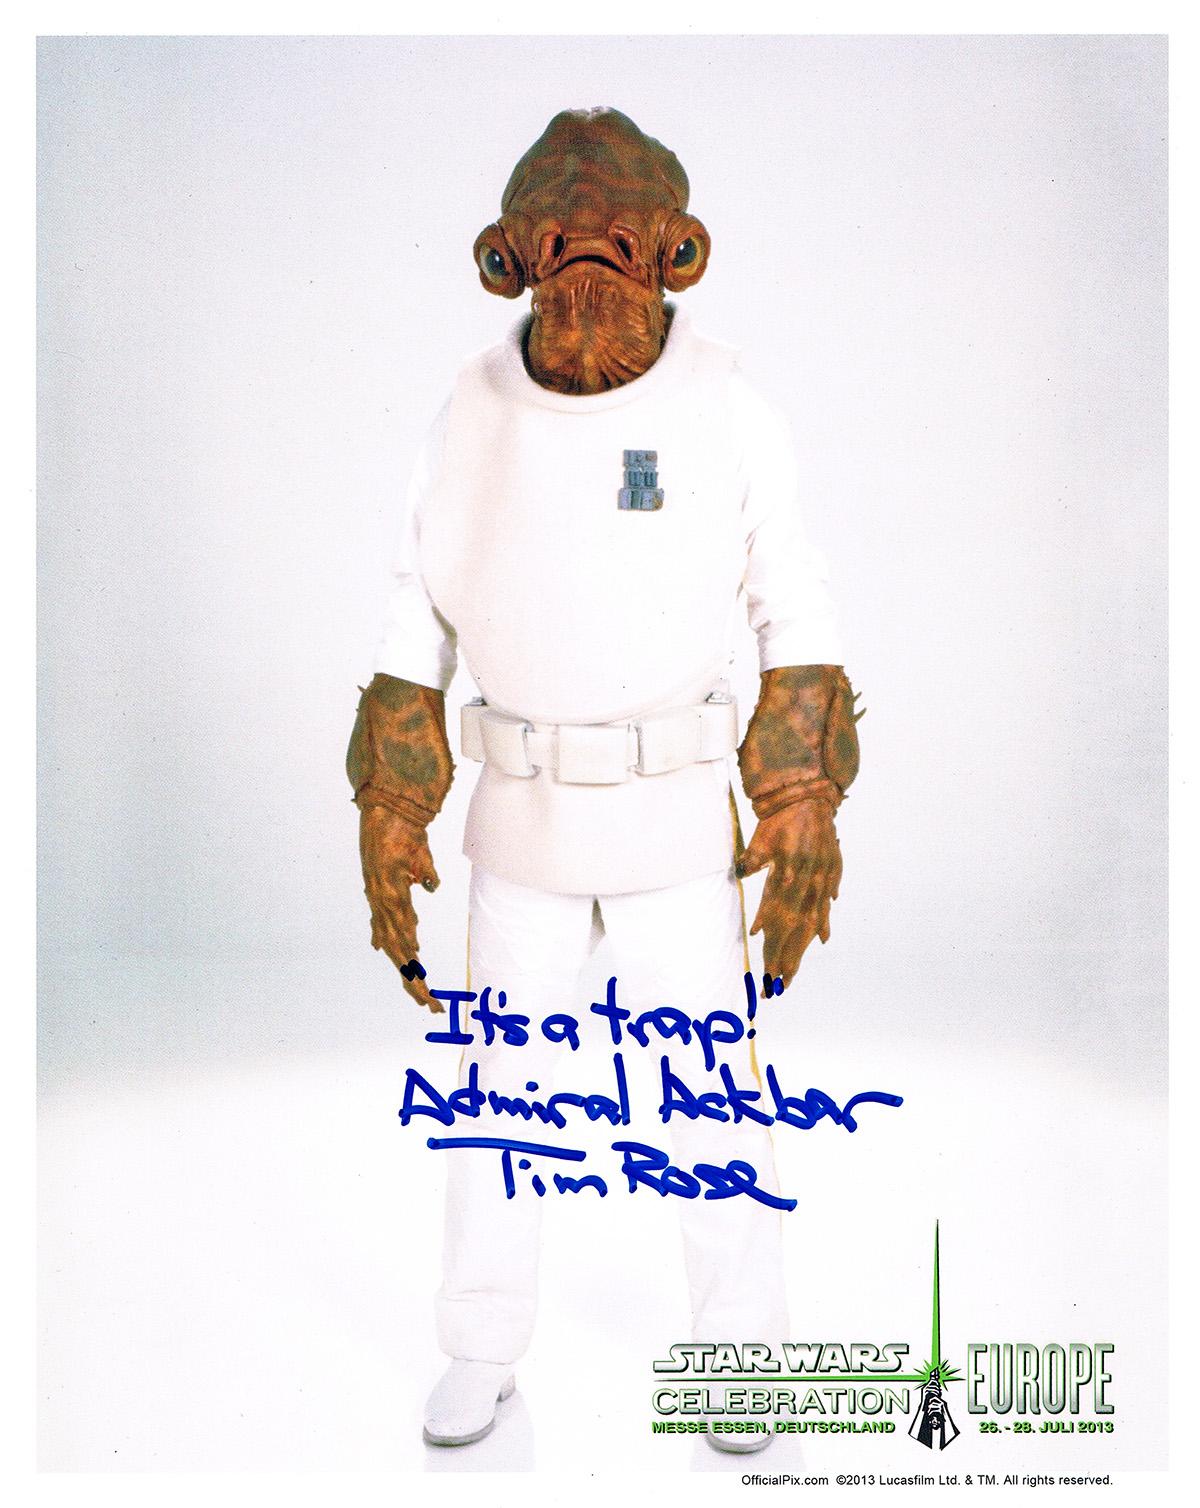 Tim Rose autograph